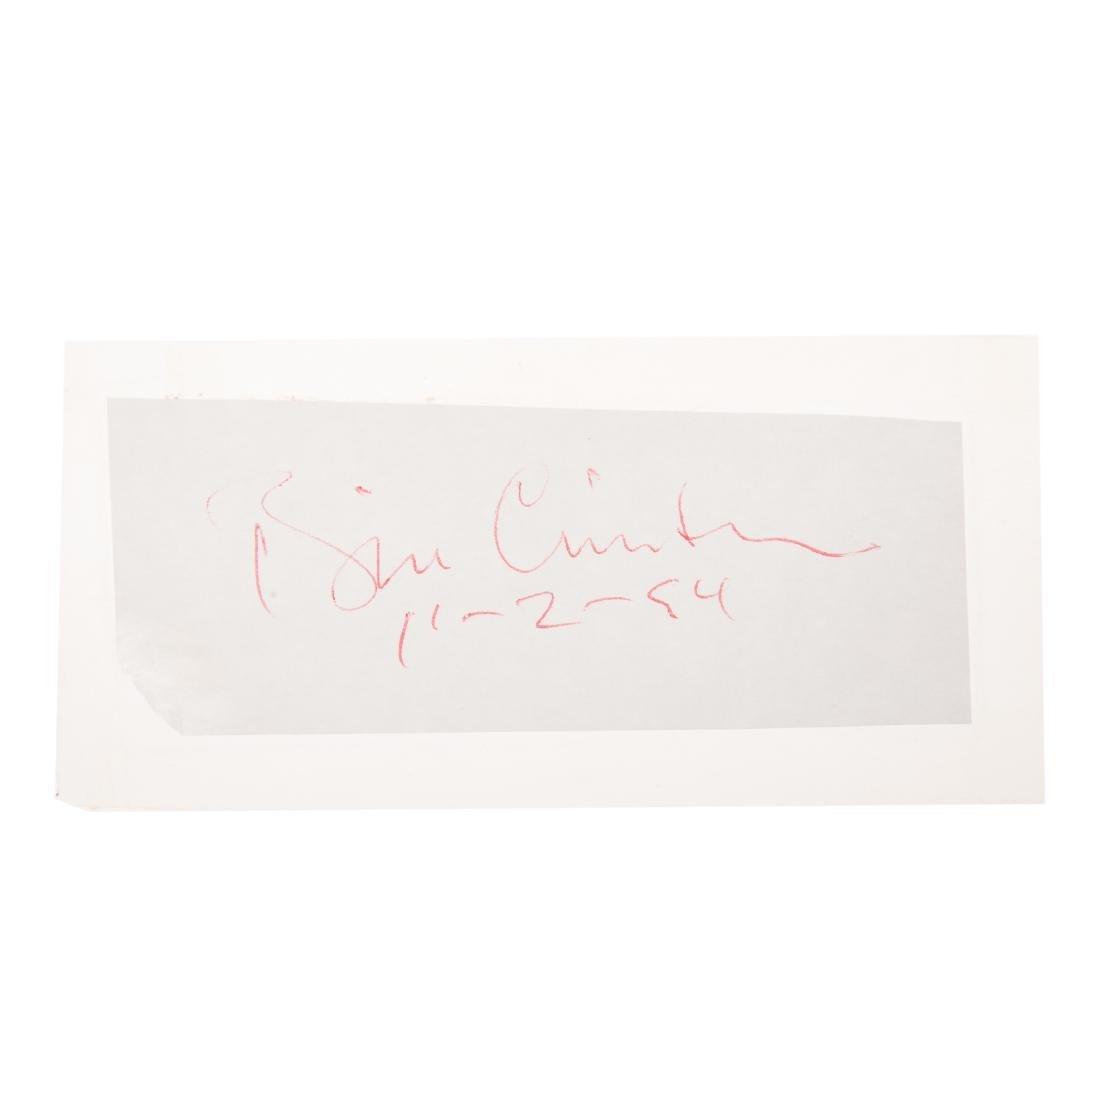 William Jefferson Clinton signature - 2